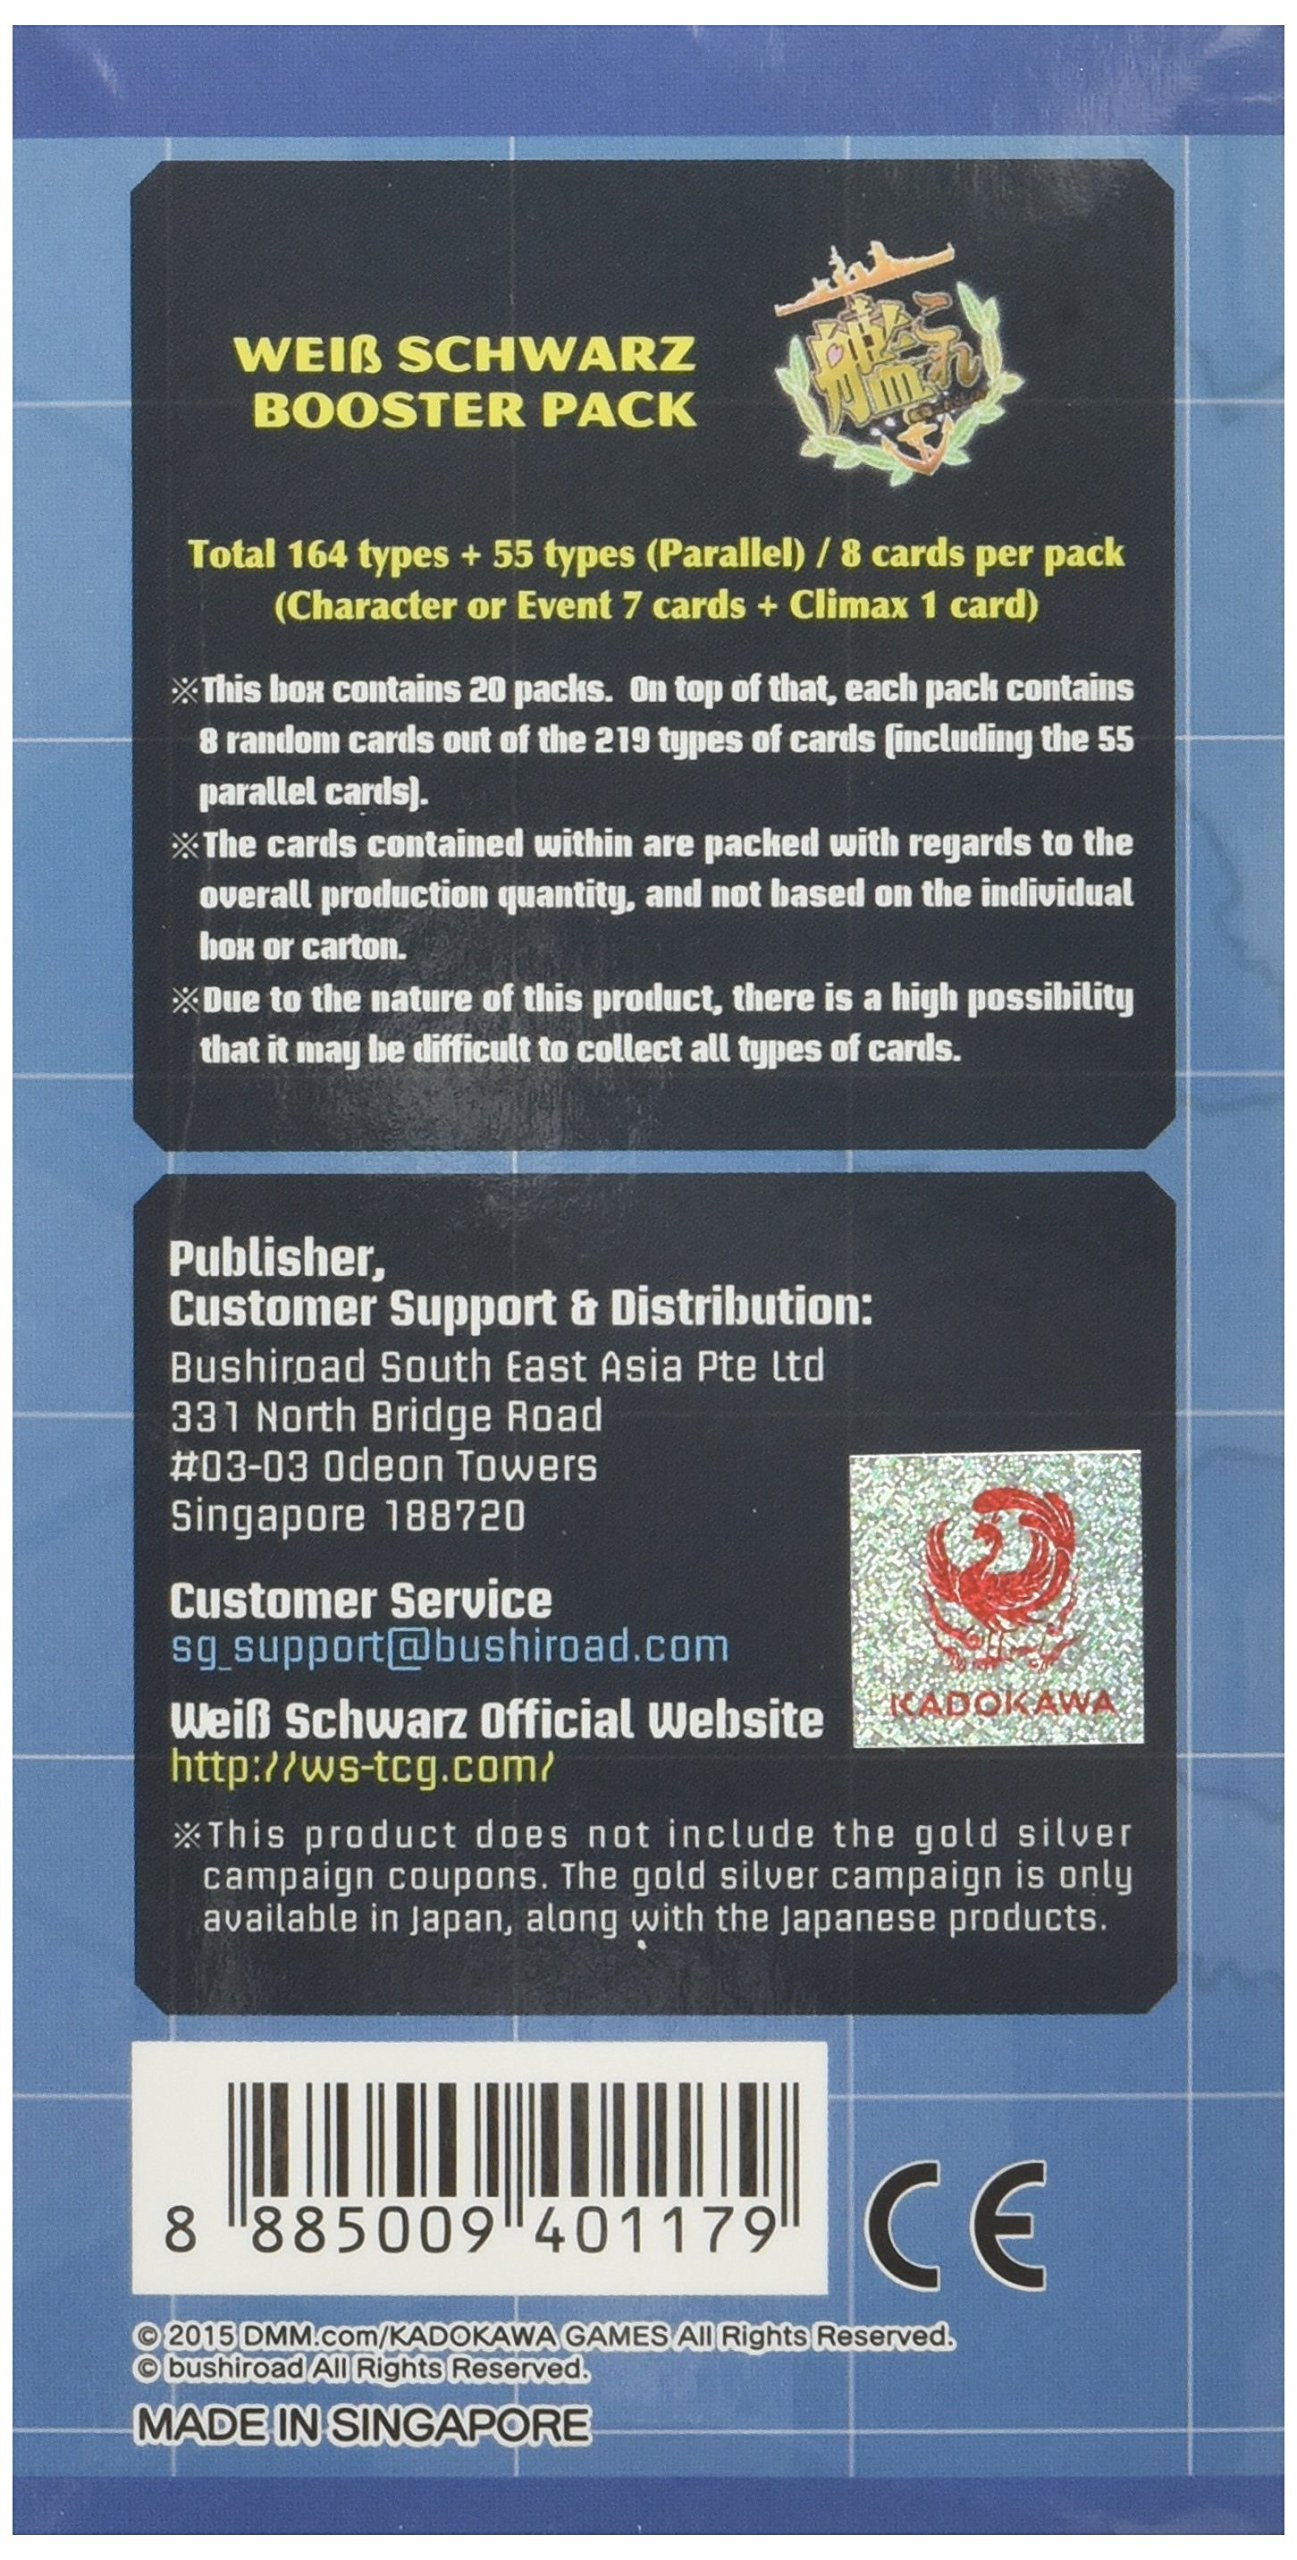 Weiss Schwarz KanColle Booster Box [English Edition] by WS Weiss Schwarz (Image #3)